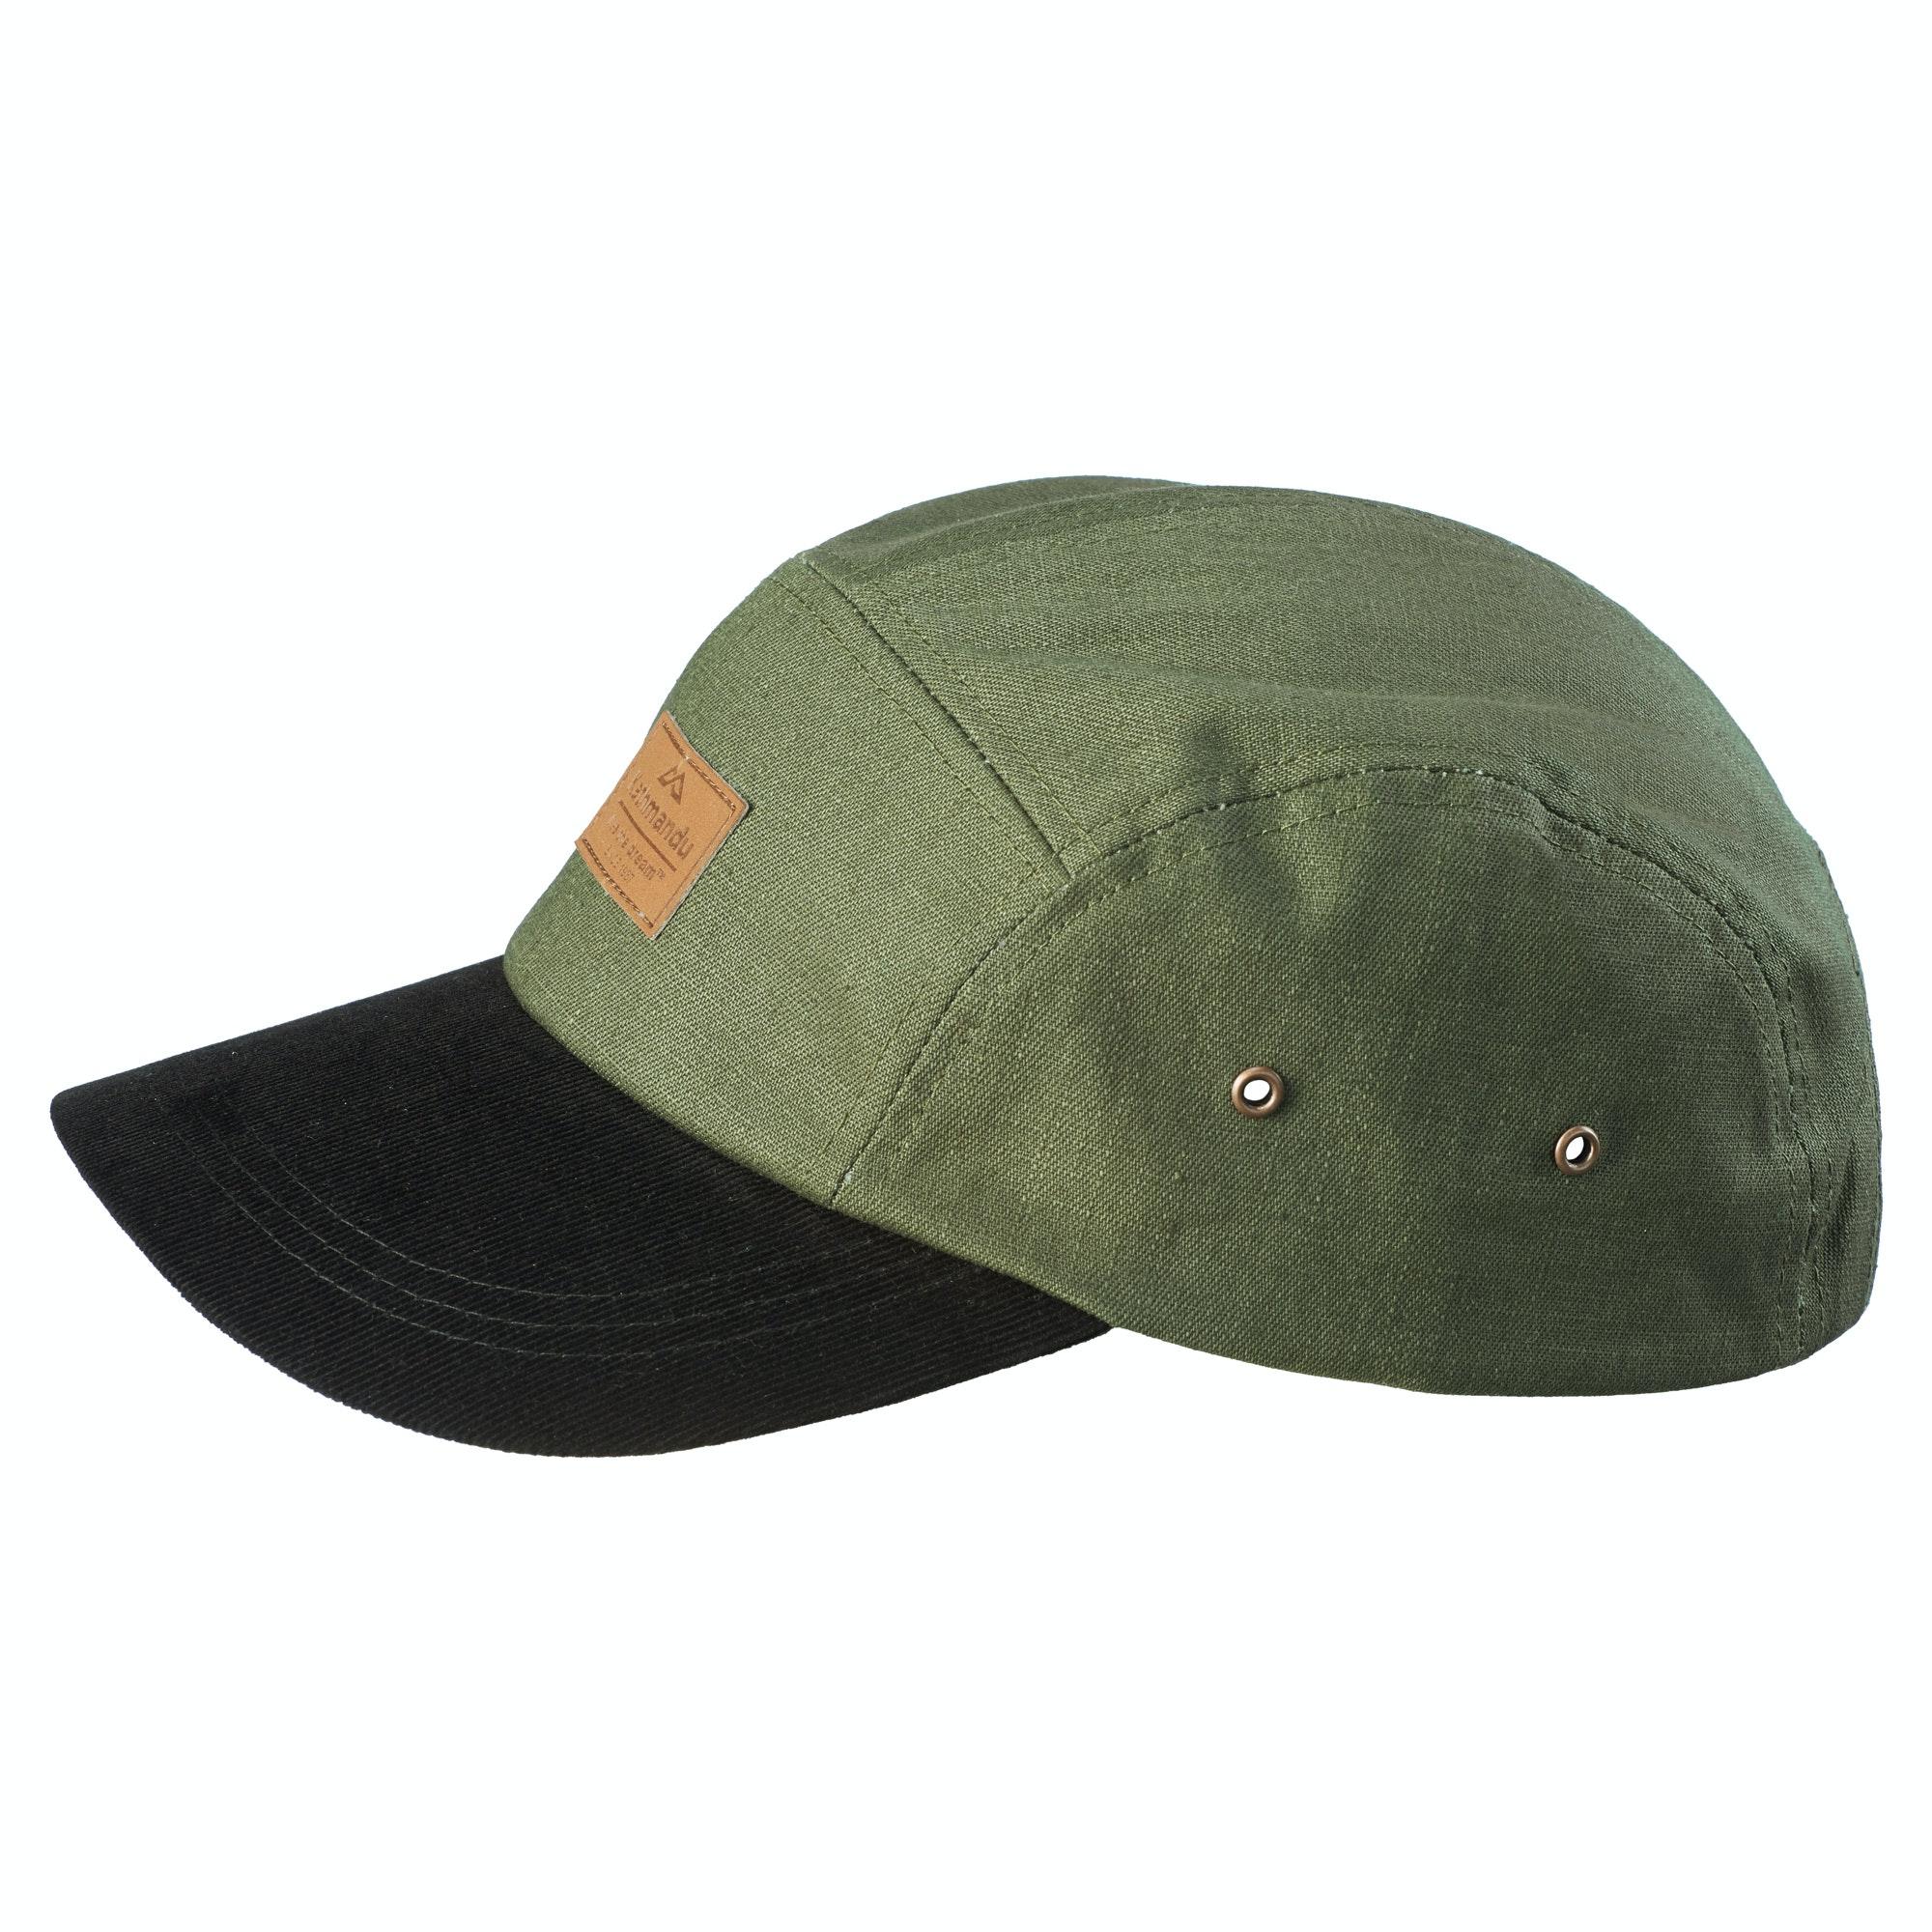 kathmandu hillsborough mens womens hat adjustable 5 panel